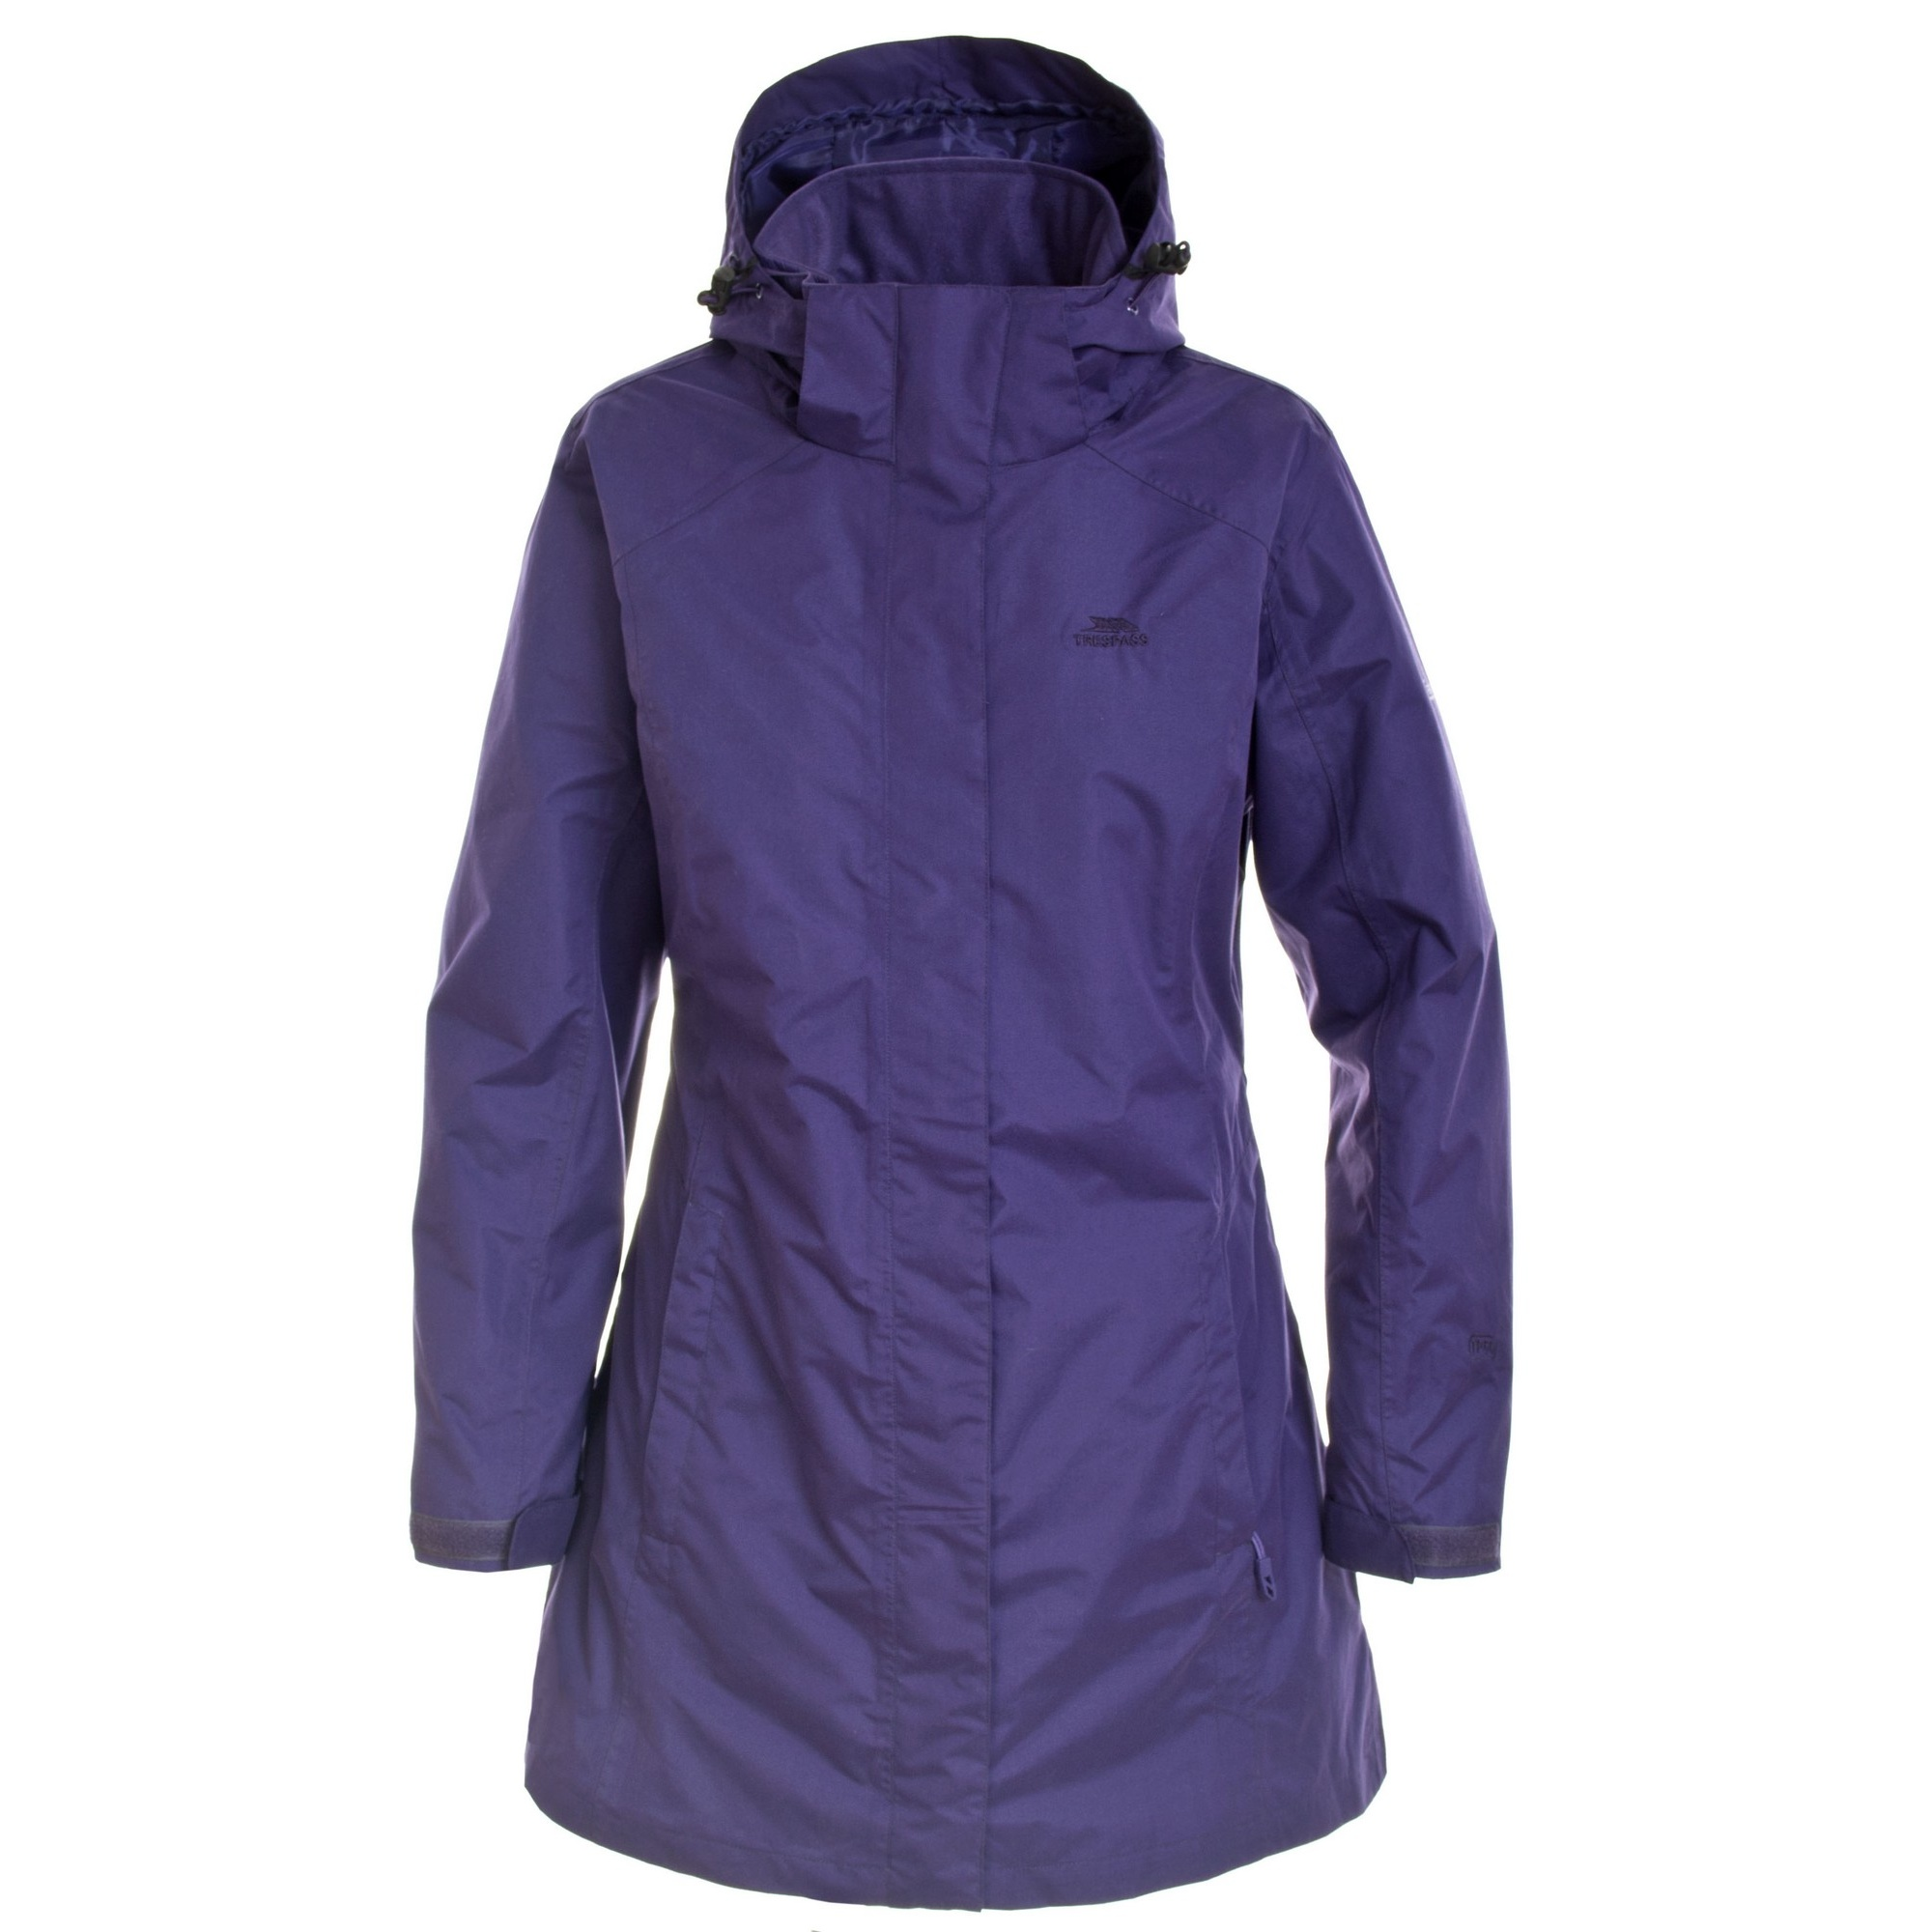 Trespass Womens/Ladies Alissa 3 In 1 Hooded Full Zip Winter ...